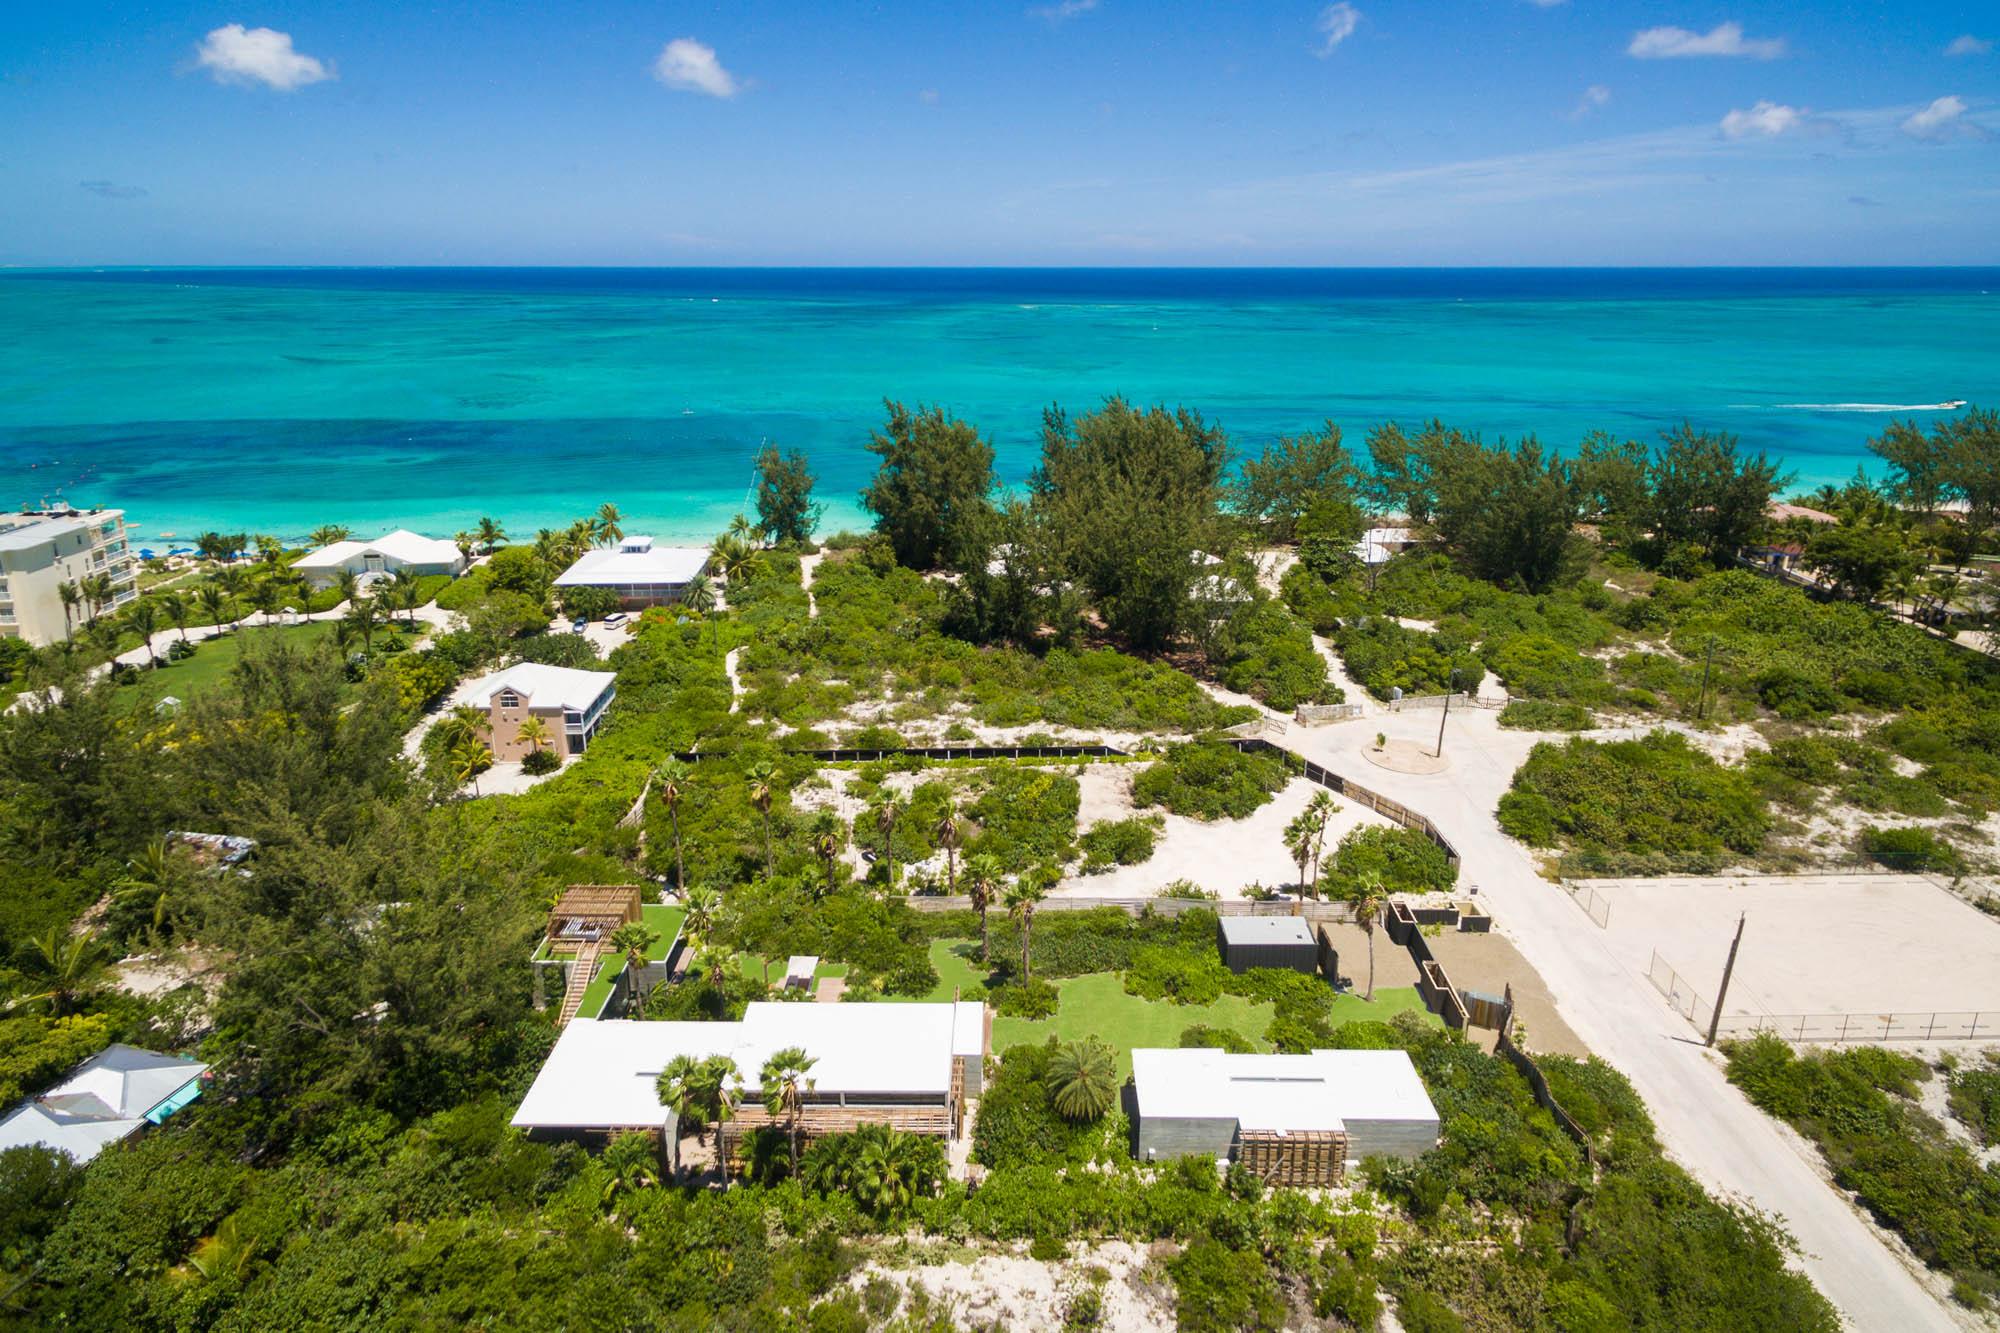 villa islander, grace bay, providenciales (provo) / turks and